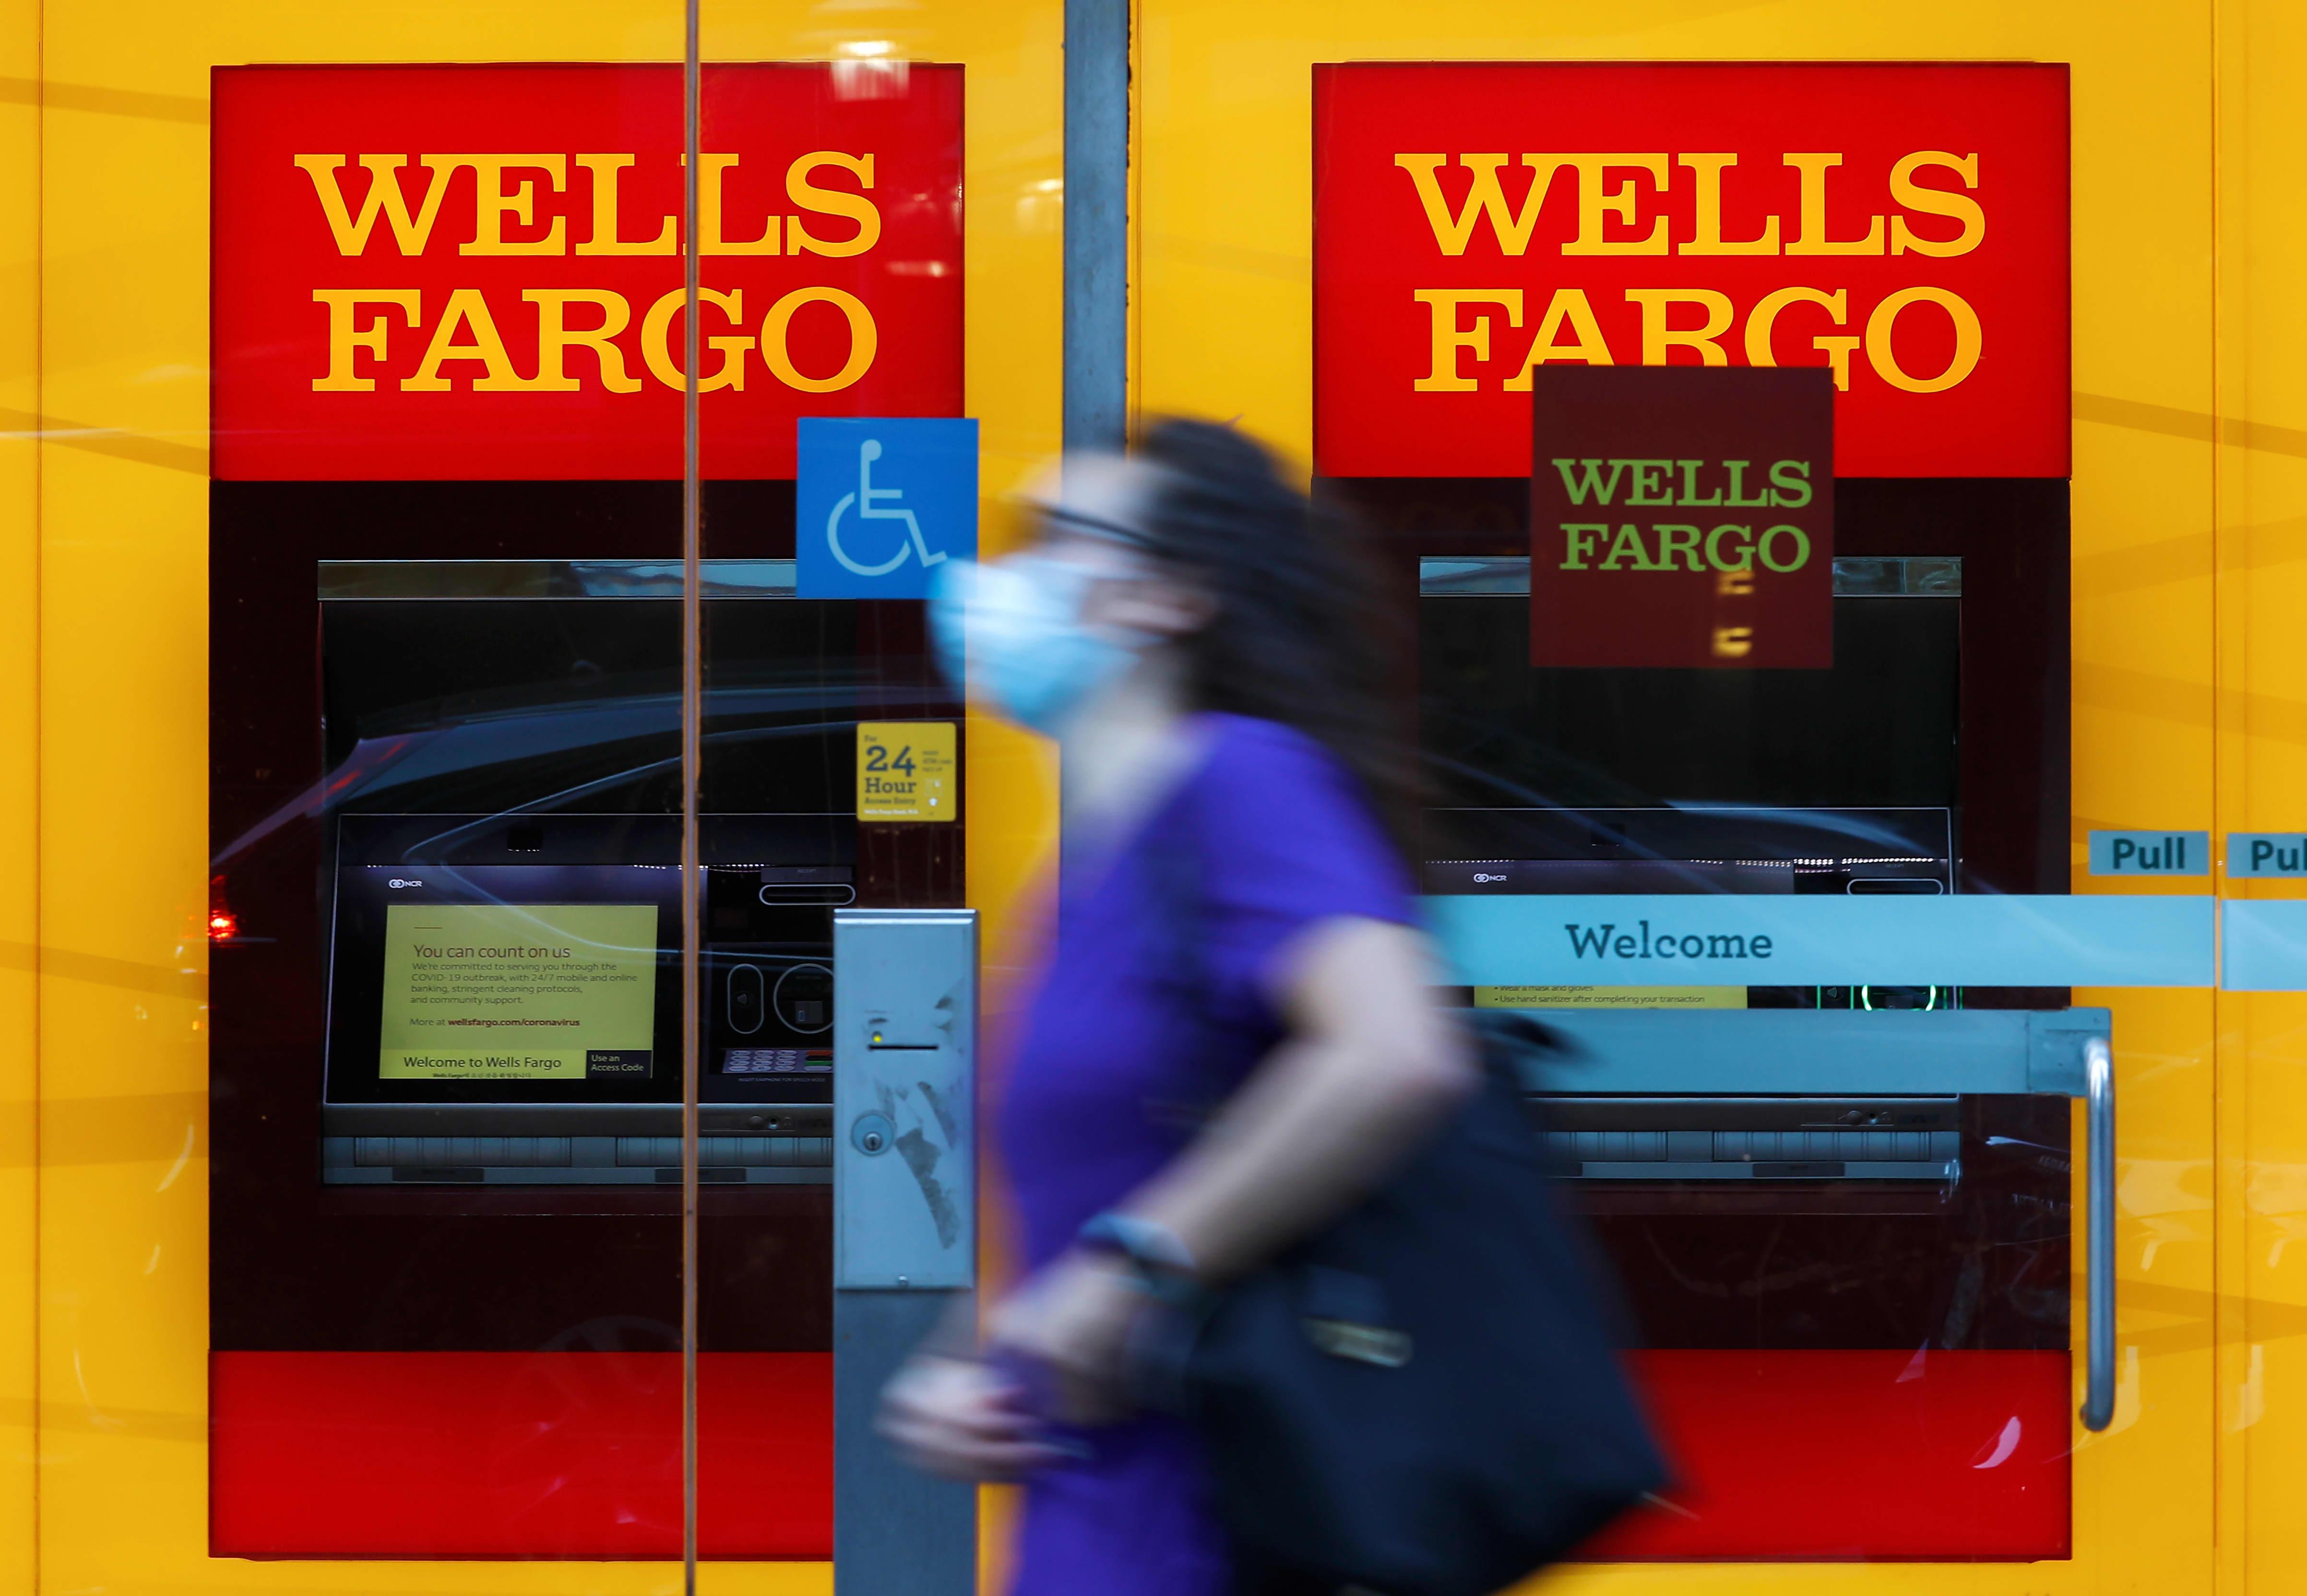 Guadagni Wells Fargo (WFC) 2 ° trimestre 2020: perdita di $ 2,4 miliardi